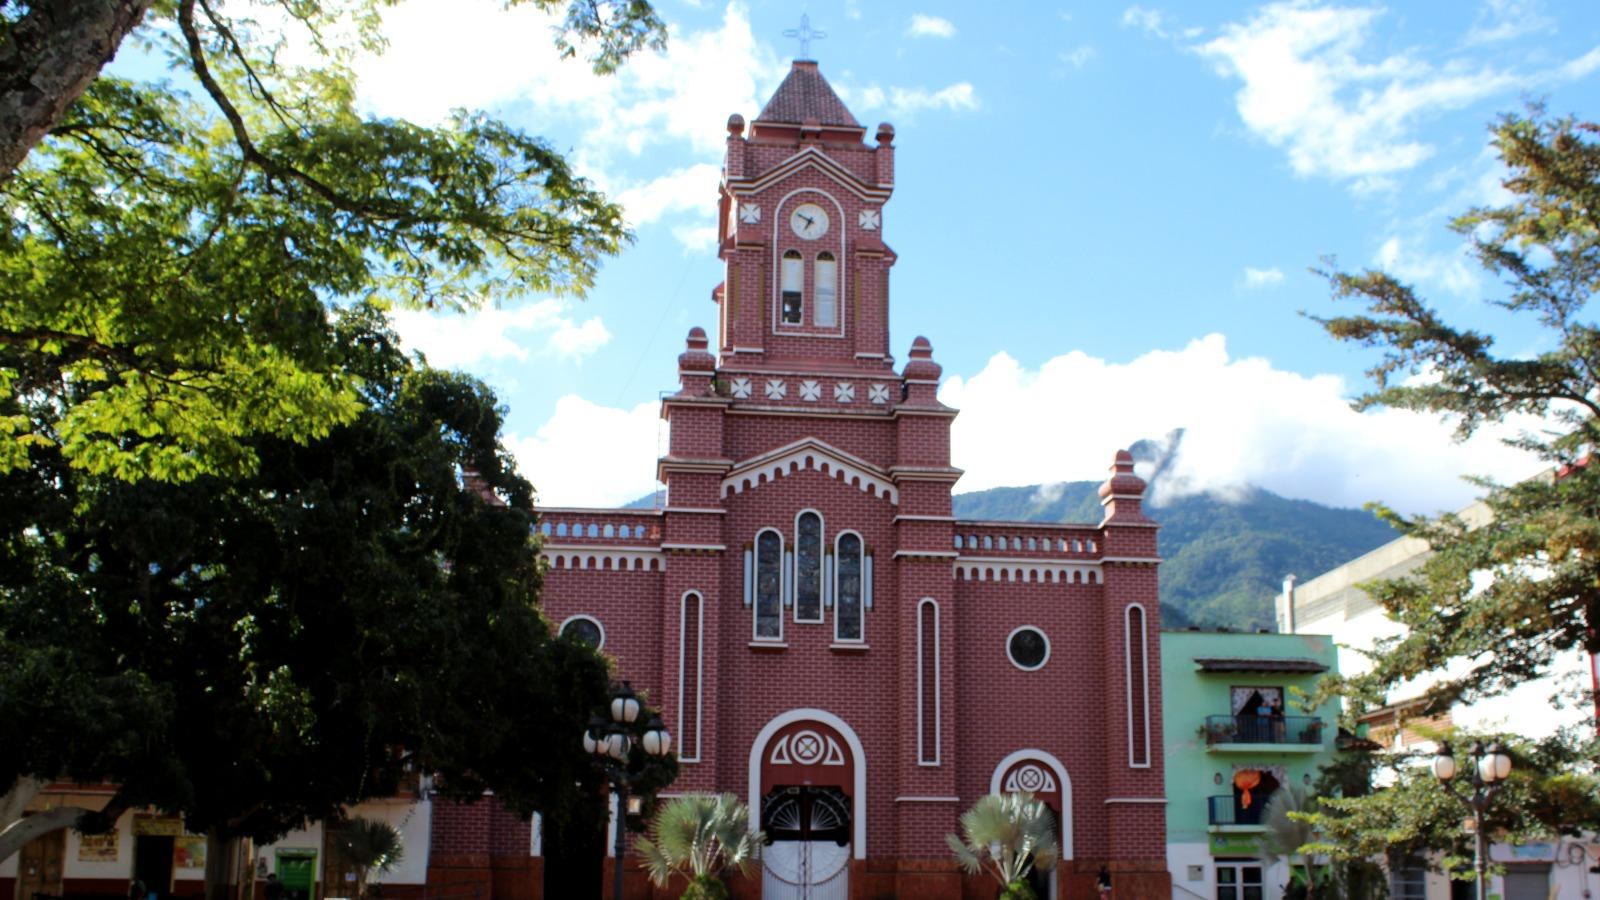 reportajes/antioquia/conozca-a-los-aspirantes-a-la-alcaldia-de-su-municipio